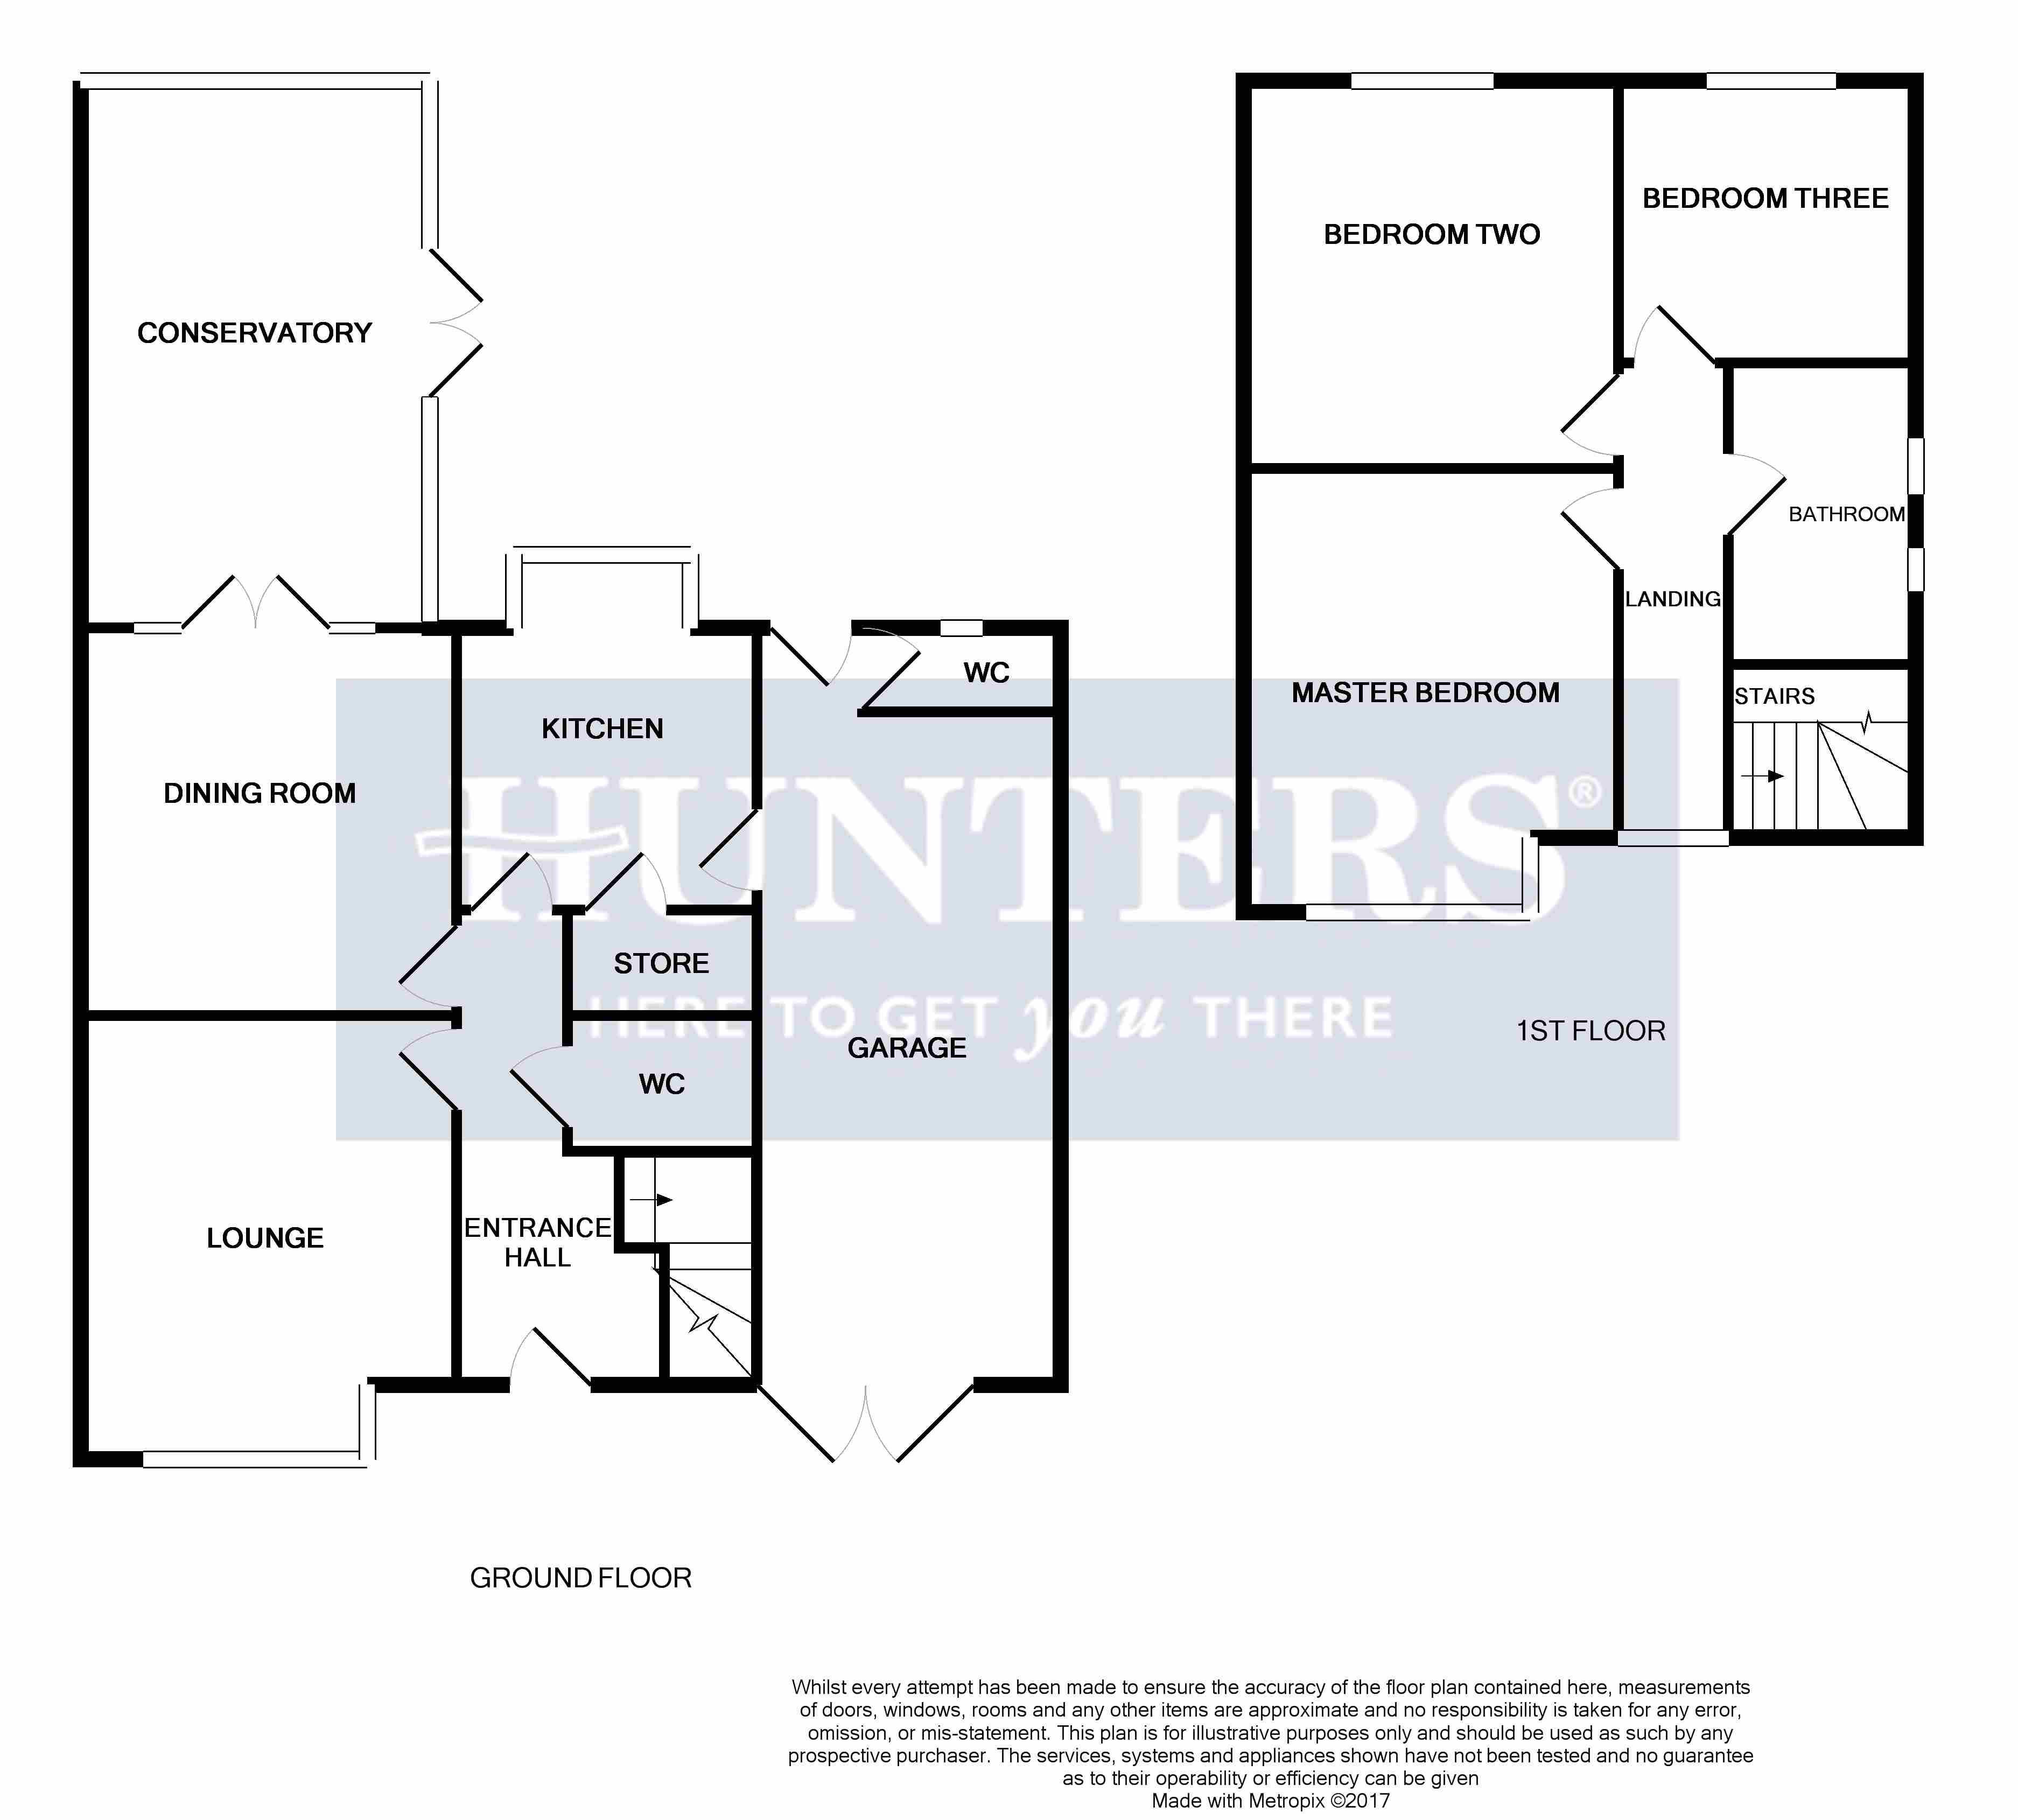 lynwood avenue wall heath dy6 3 bedroom semi detached house for floor plan view original